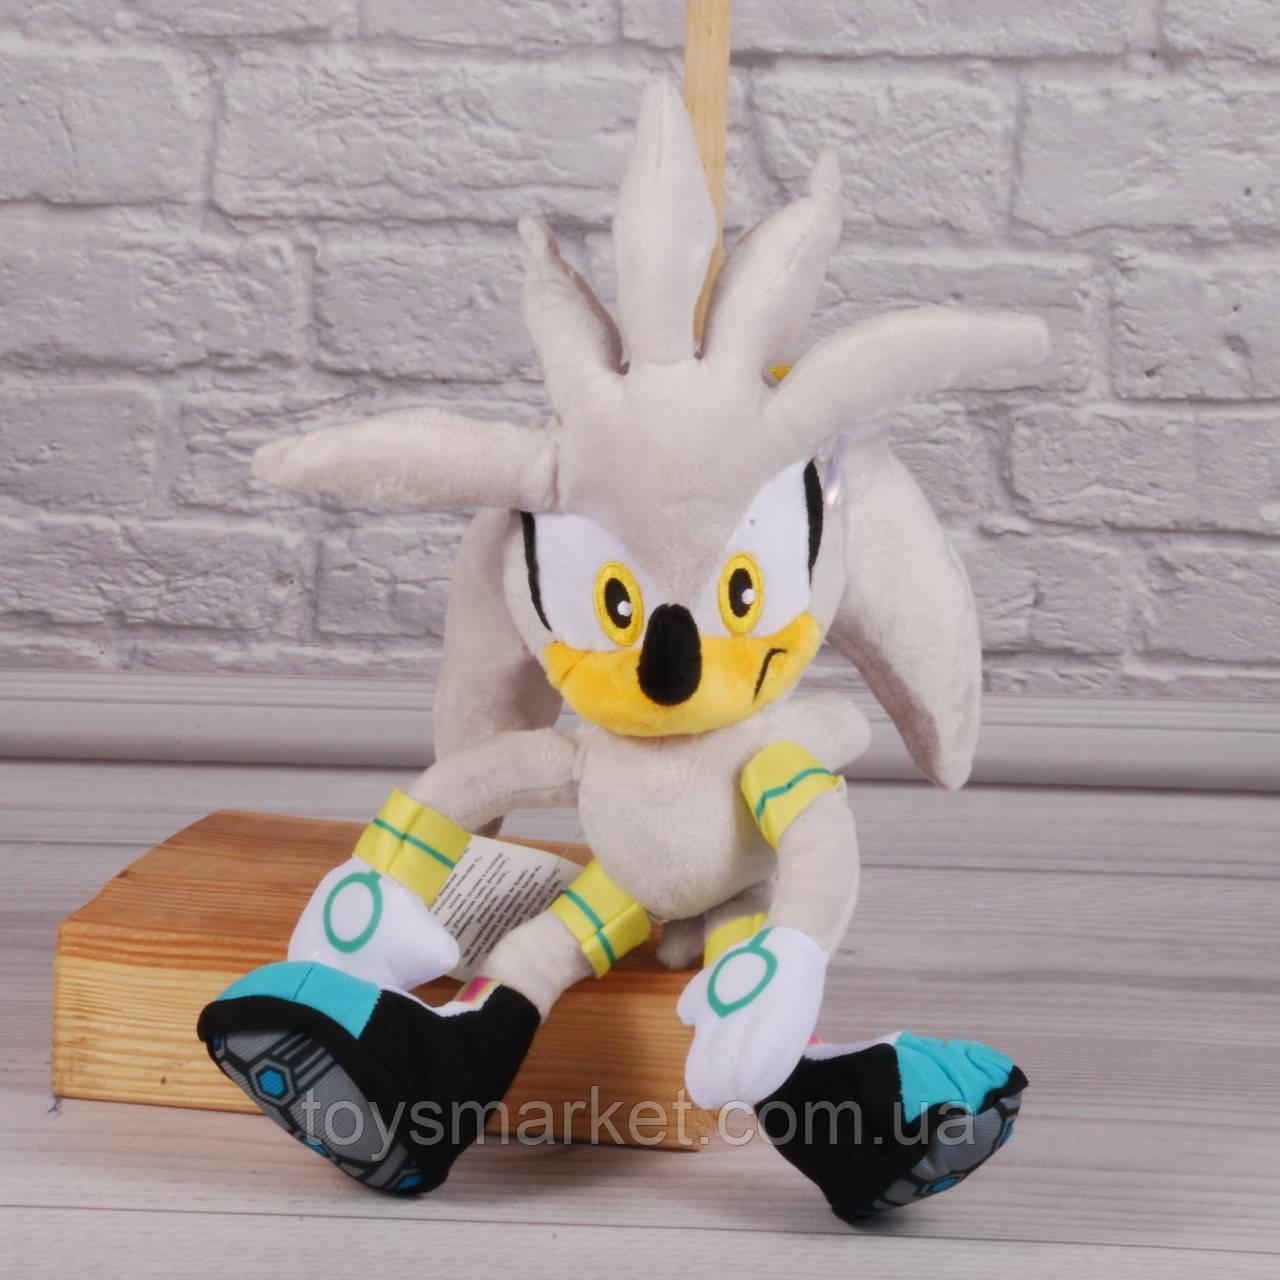 Мягкая игрушка Ёж Сильвер,  Silver the Hedgehog, серый еж из игры «Sonic the Hedgehog»